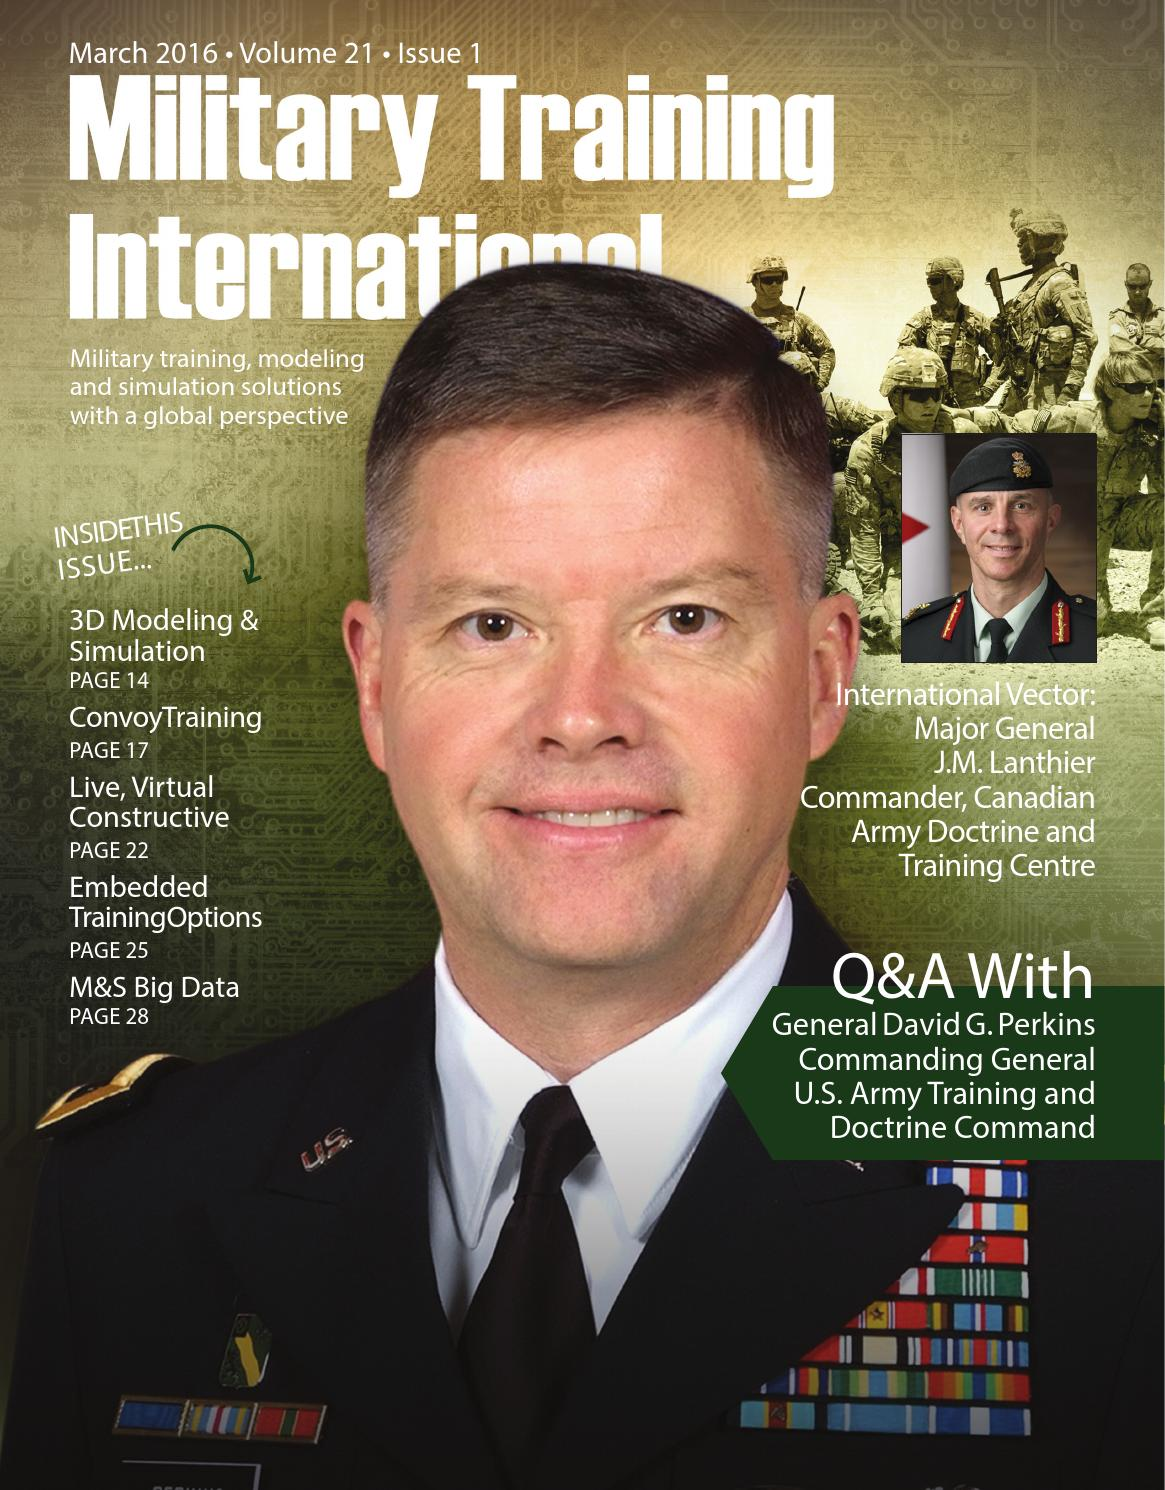 Military Training International by Jeff McKaughan - issuu